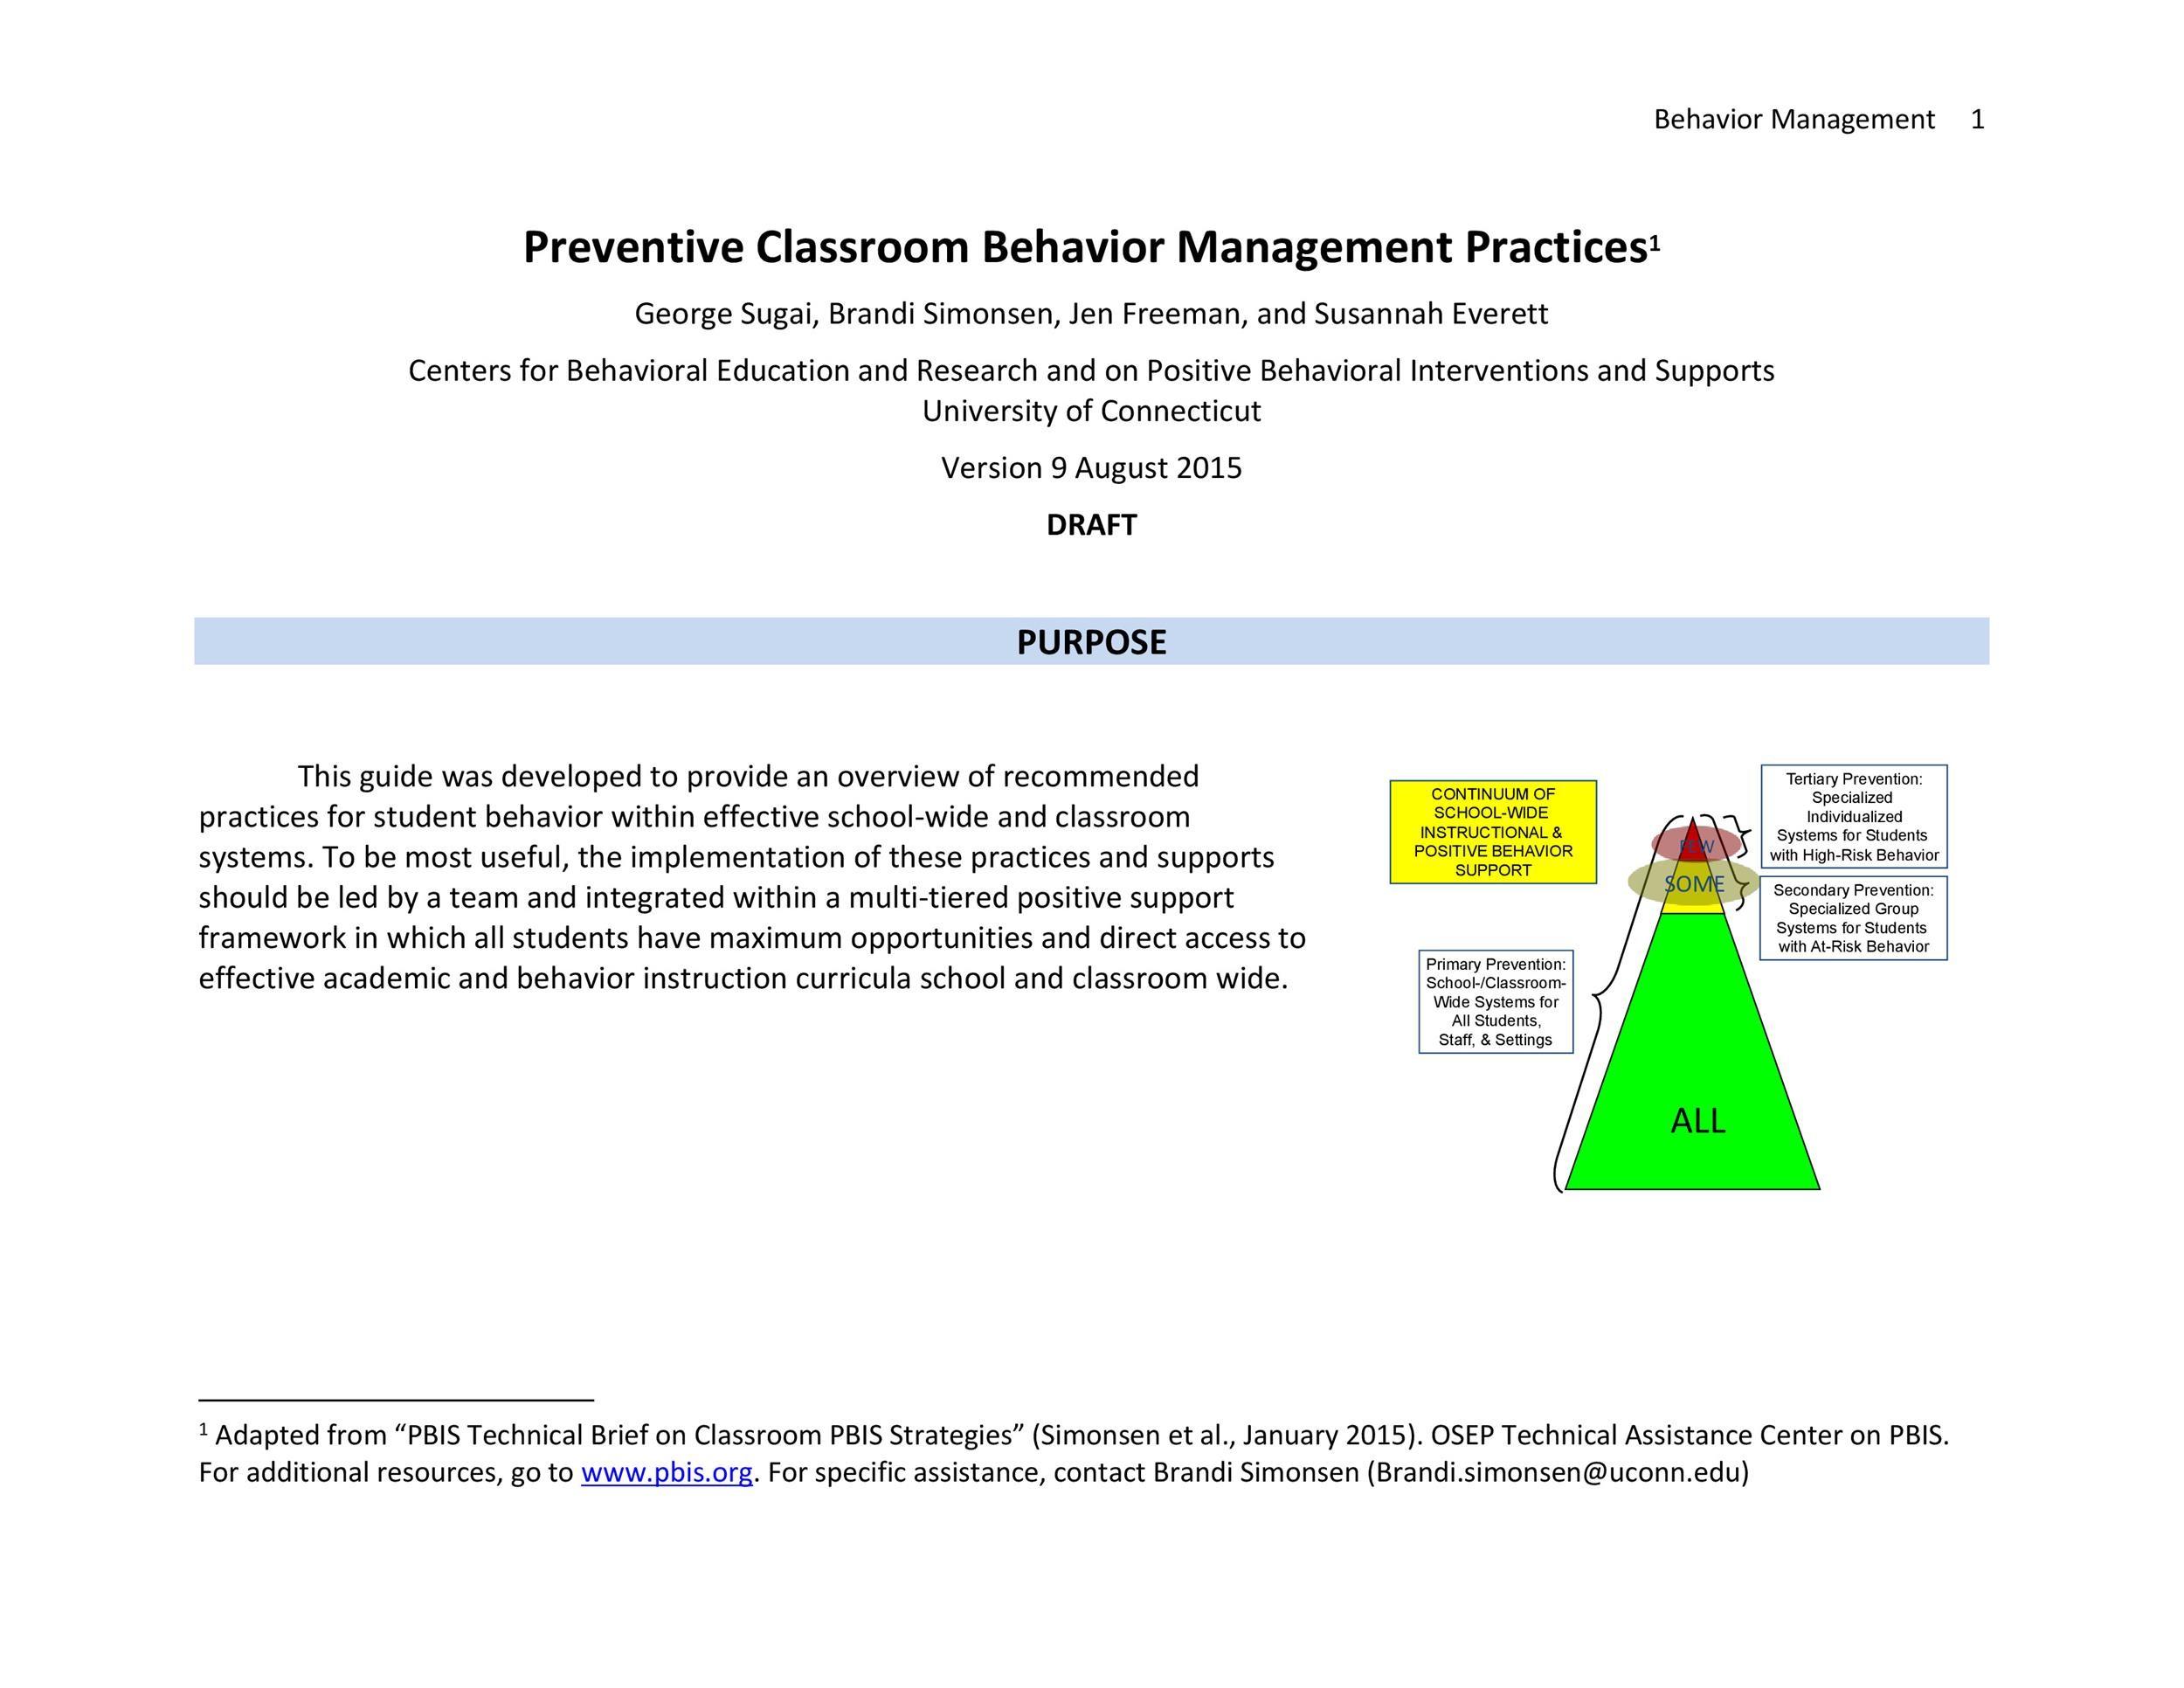 Classroom Management Plan - 38 Templates  Examples - Template Lab - clroom management plan template